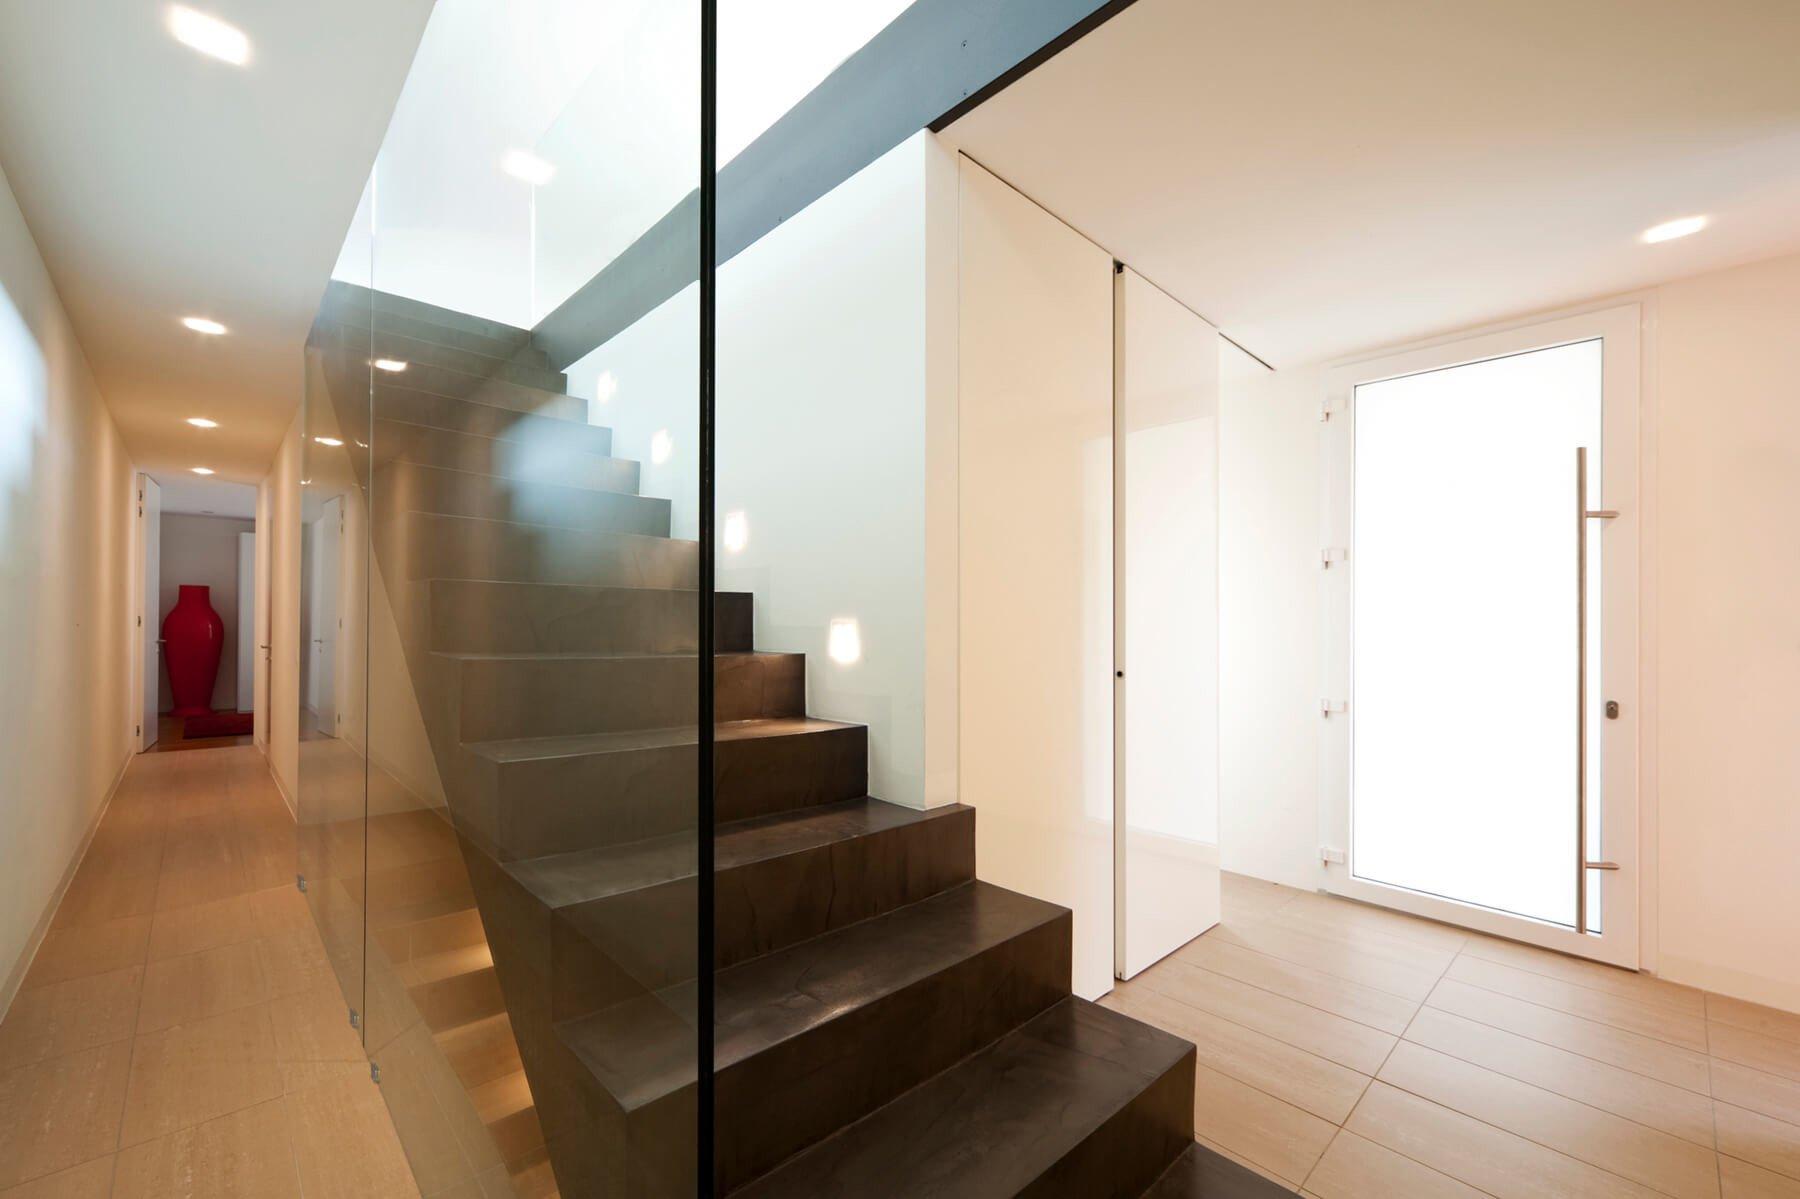 Treppe verglast mit Trennwand